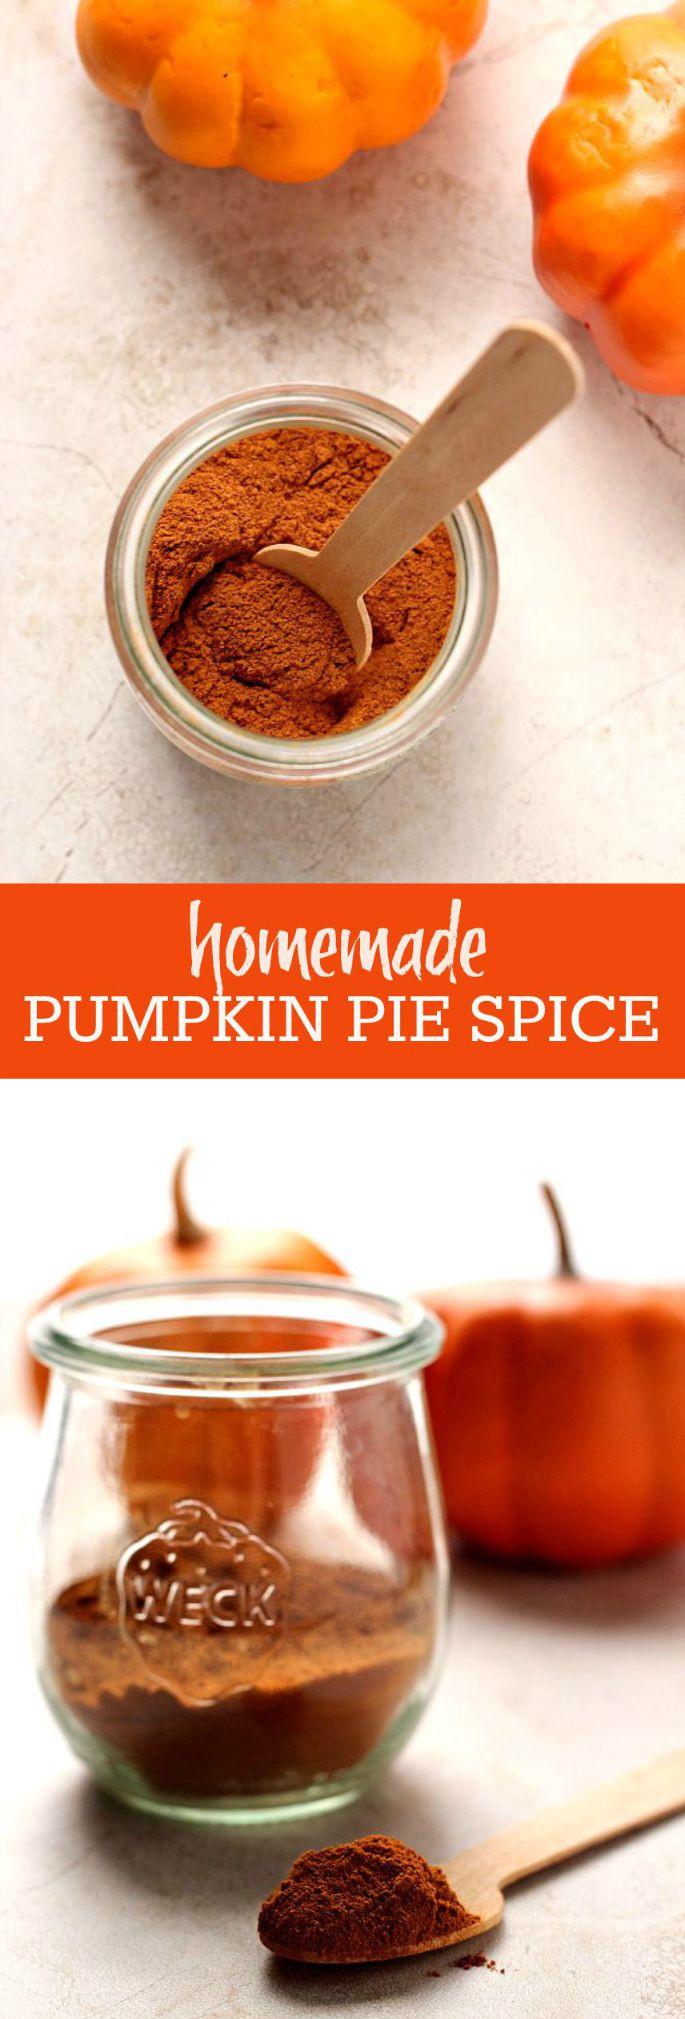 Best ideas about DIY Pumpkin Pie Spice . Save or Pin Homemade Pumpkin Pie Spice Crunchy Creamy Sweet Now.